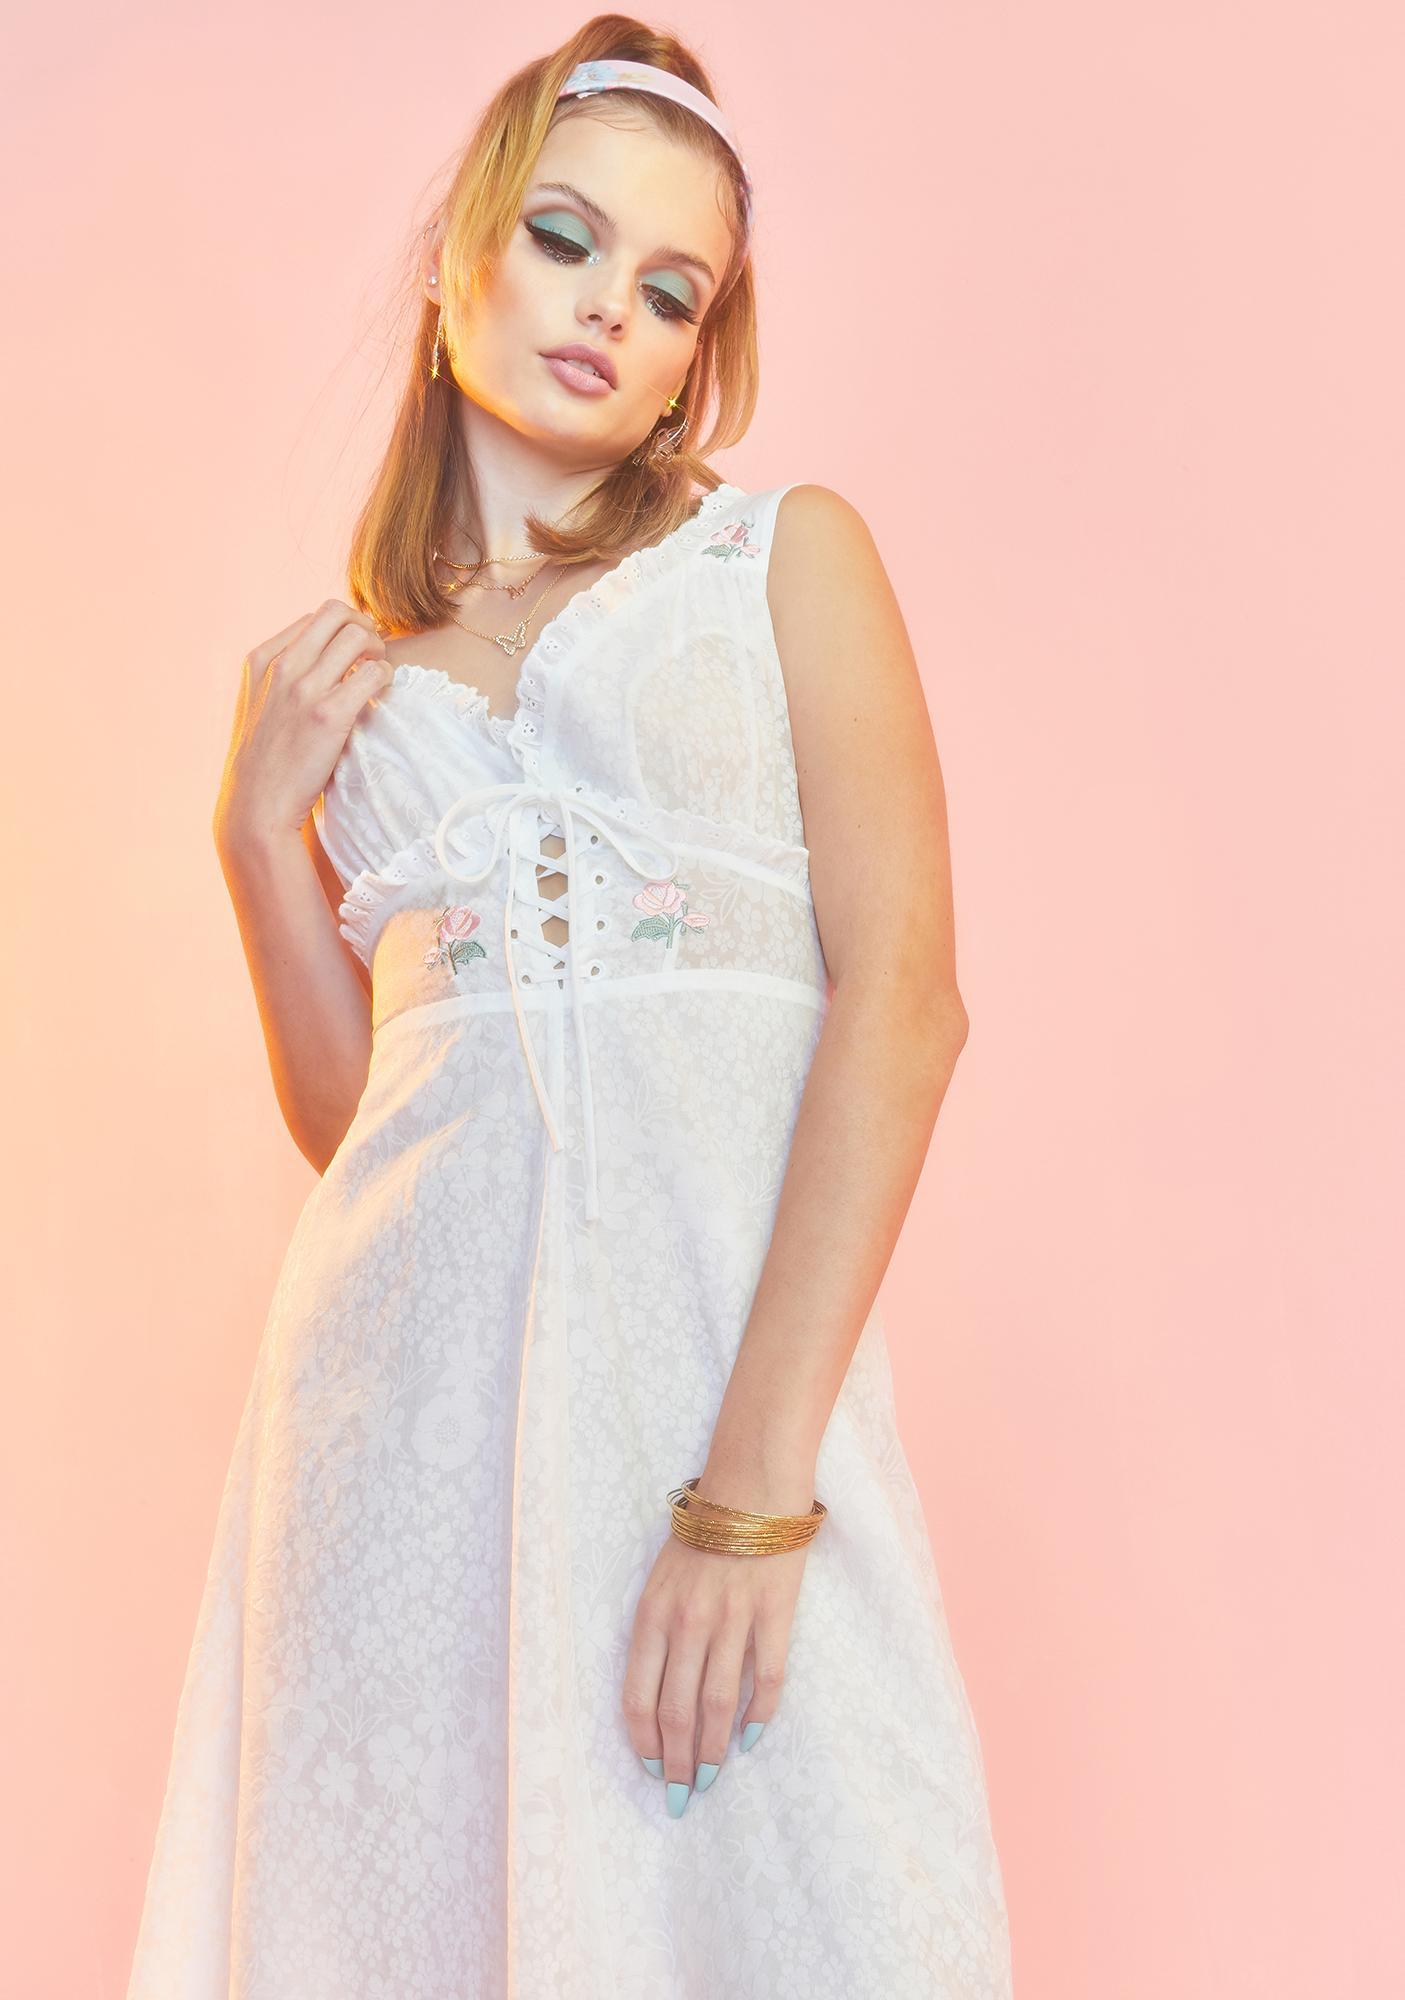 Sugar Thrillz One More Chance Maxi Dress